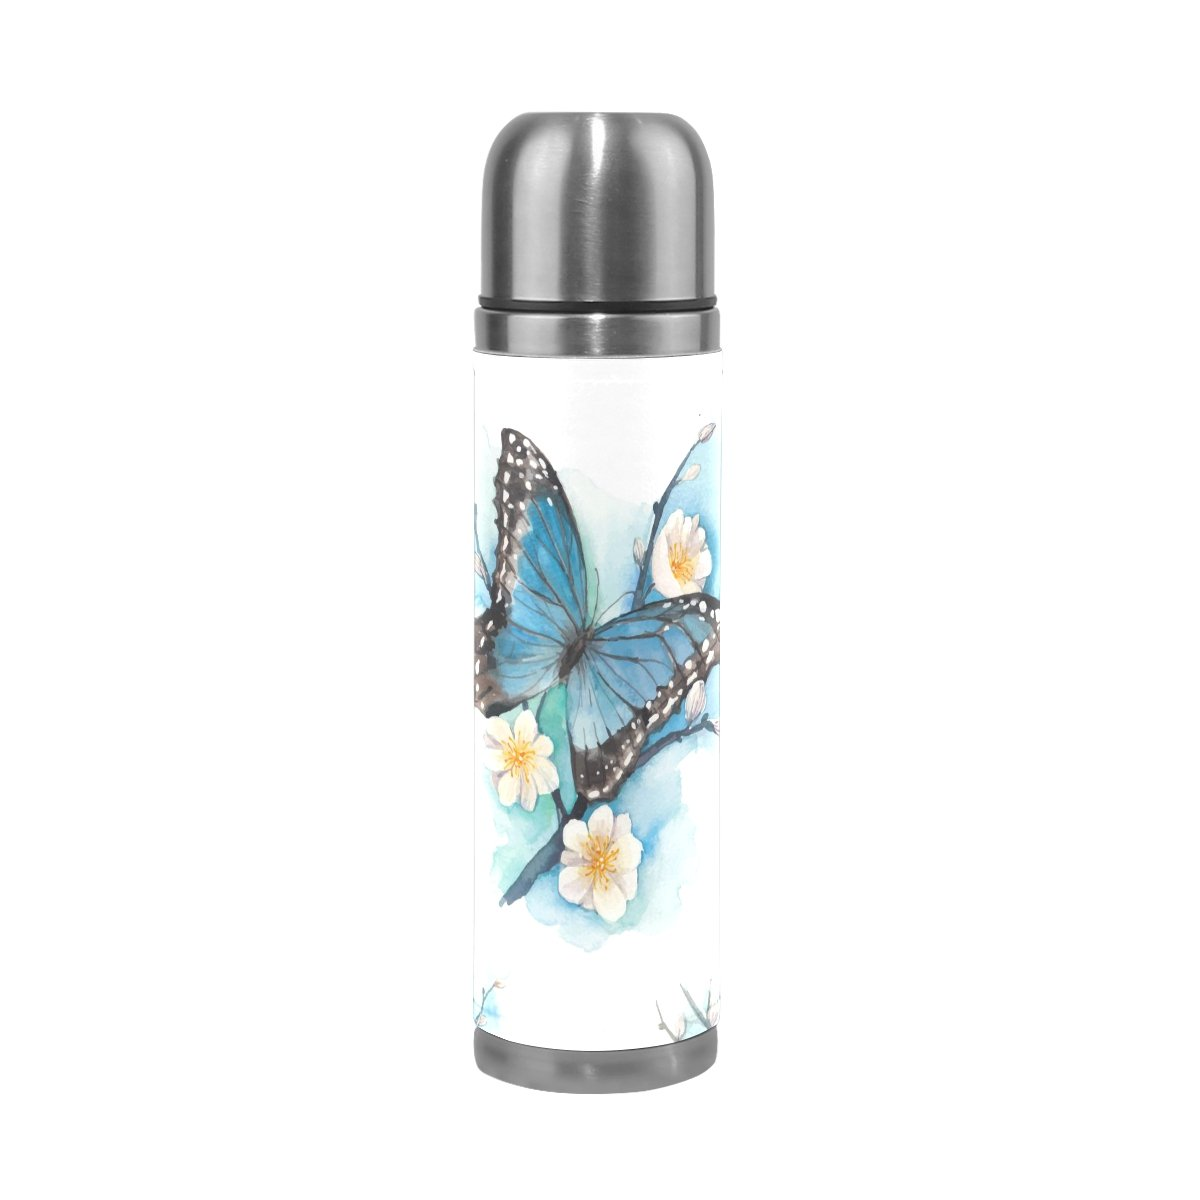 JSTeLバタフライステンレススチールウォーターボトル真空断熱真空ボトルを漏れ防止ダブルホットコーヒーまたはコールドティー+ Drink Cup Top 500 ml B075FLSM7K